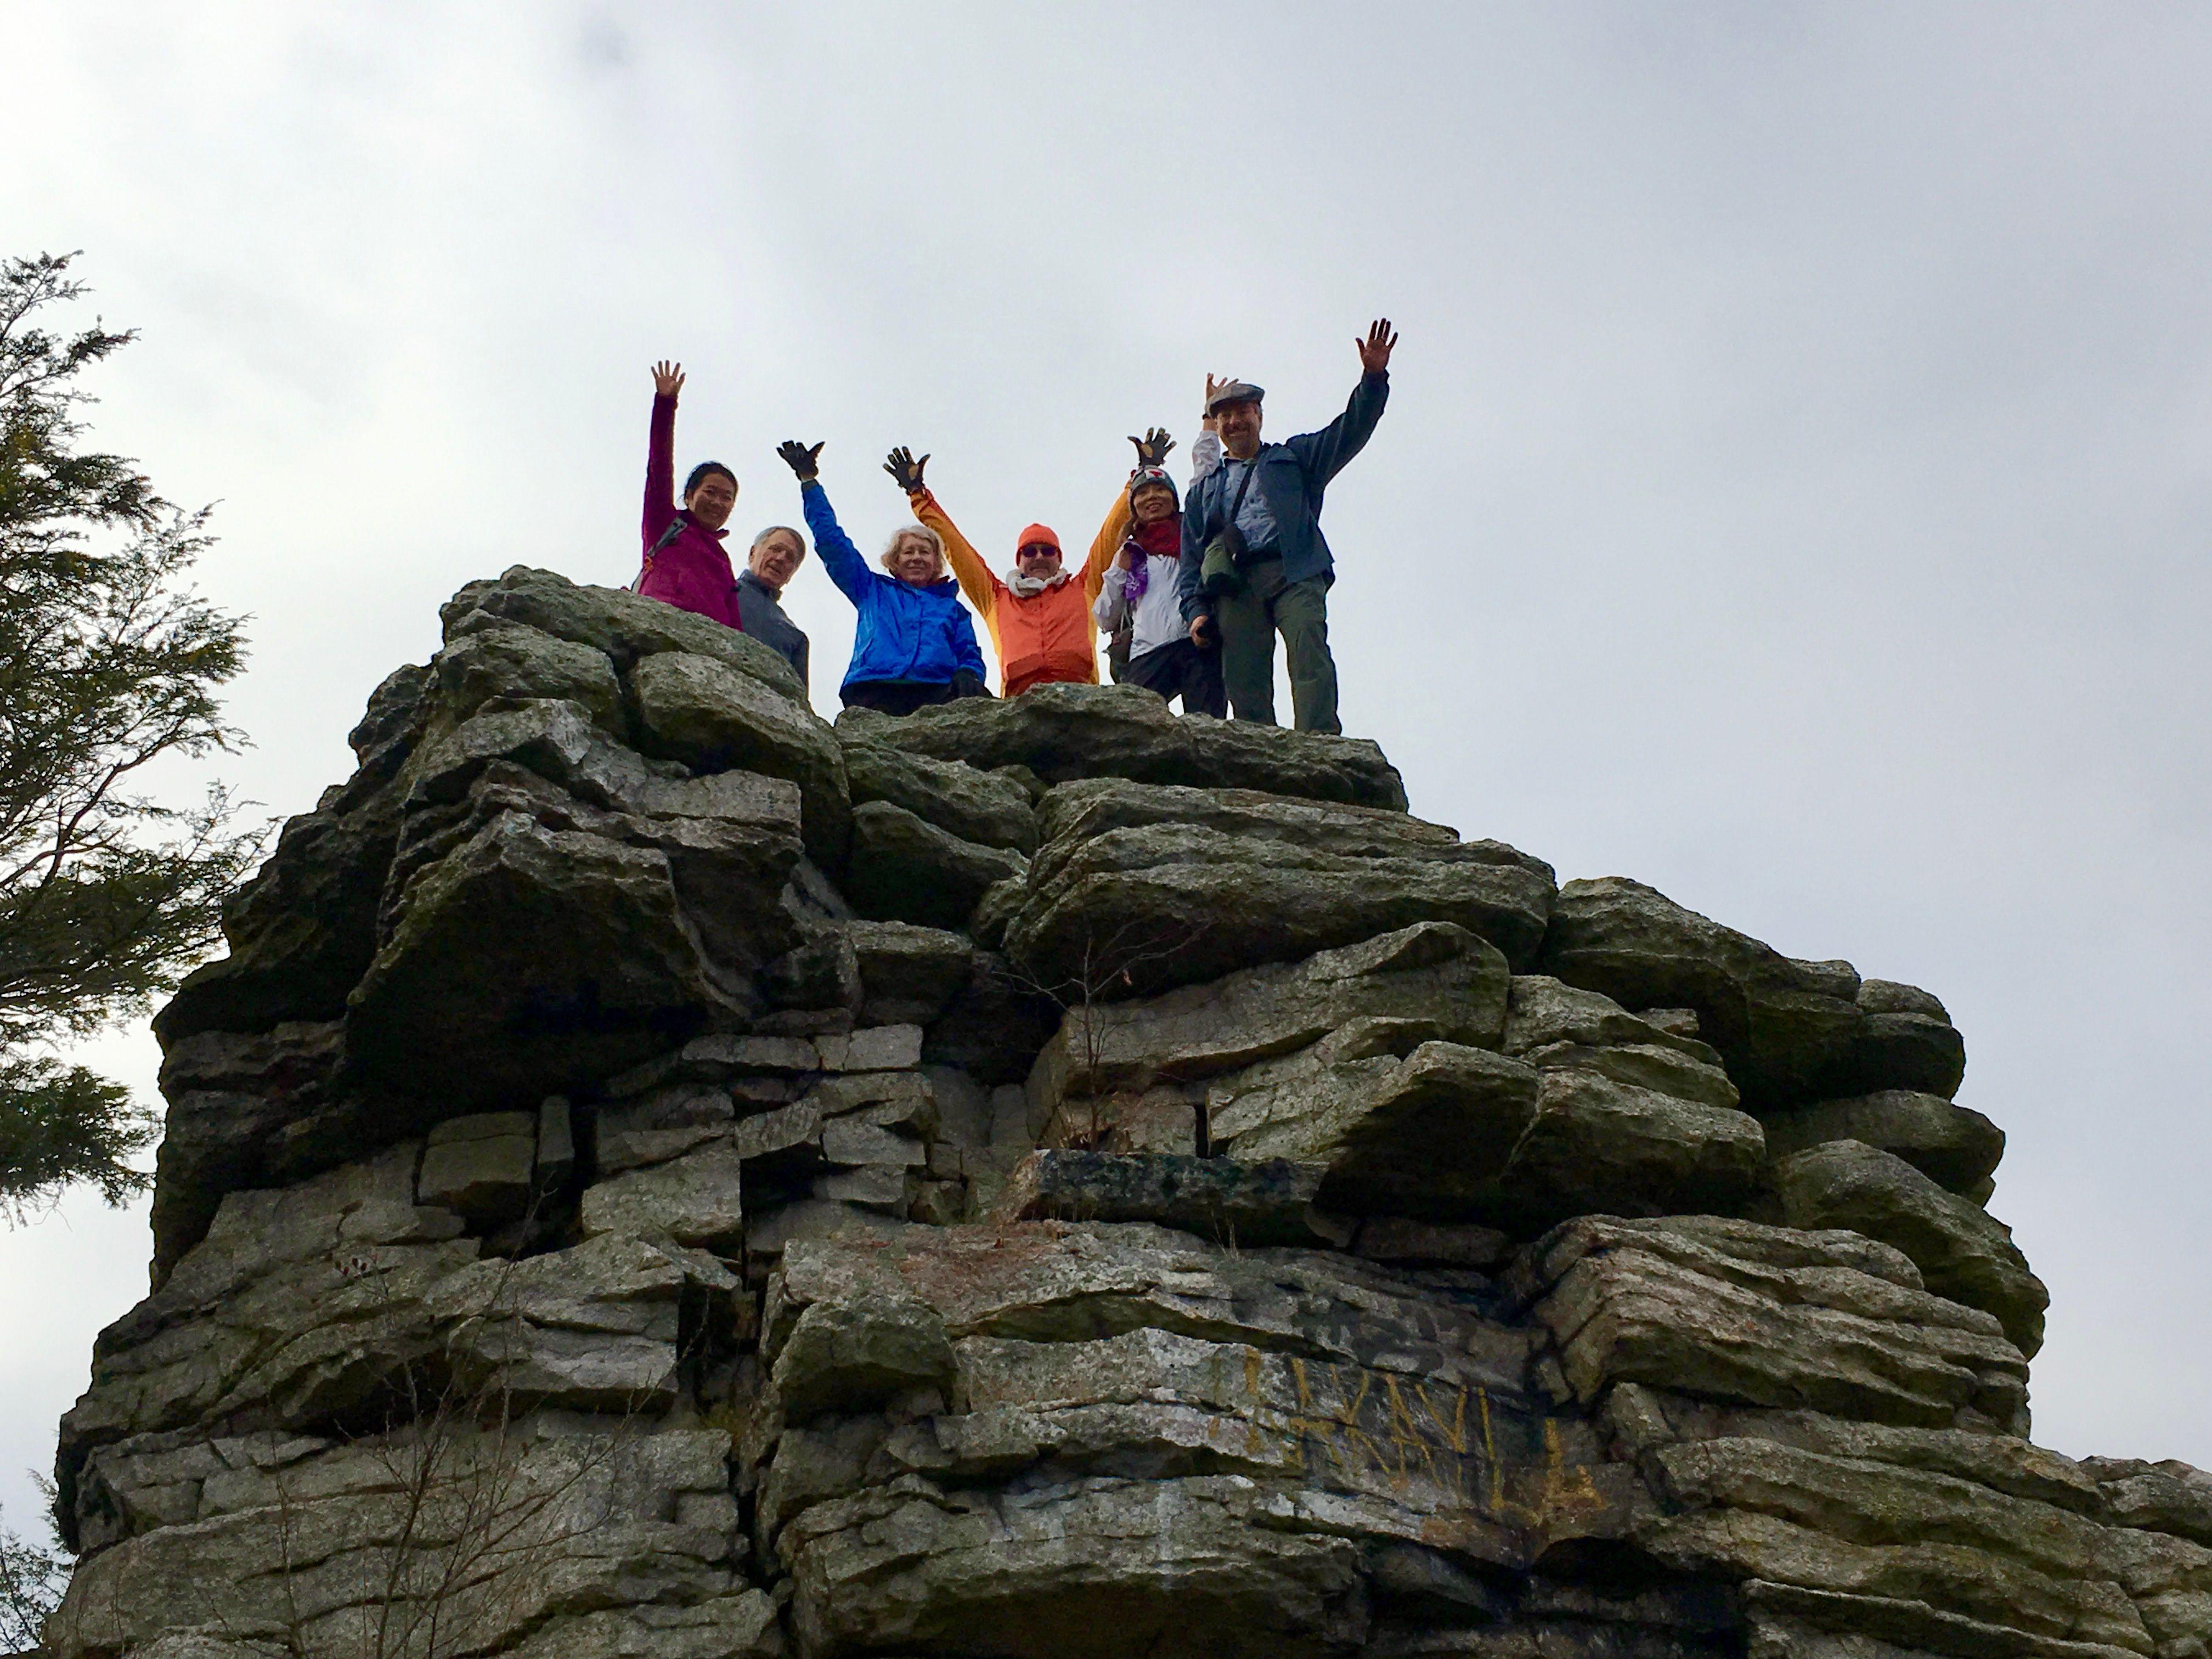 Allentown Hiking Club Meetup Group